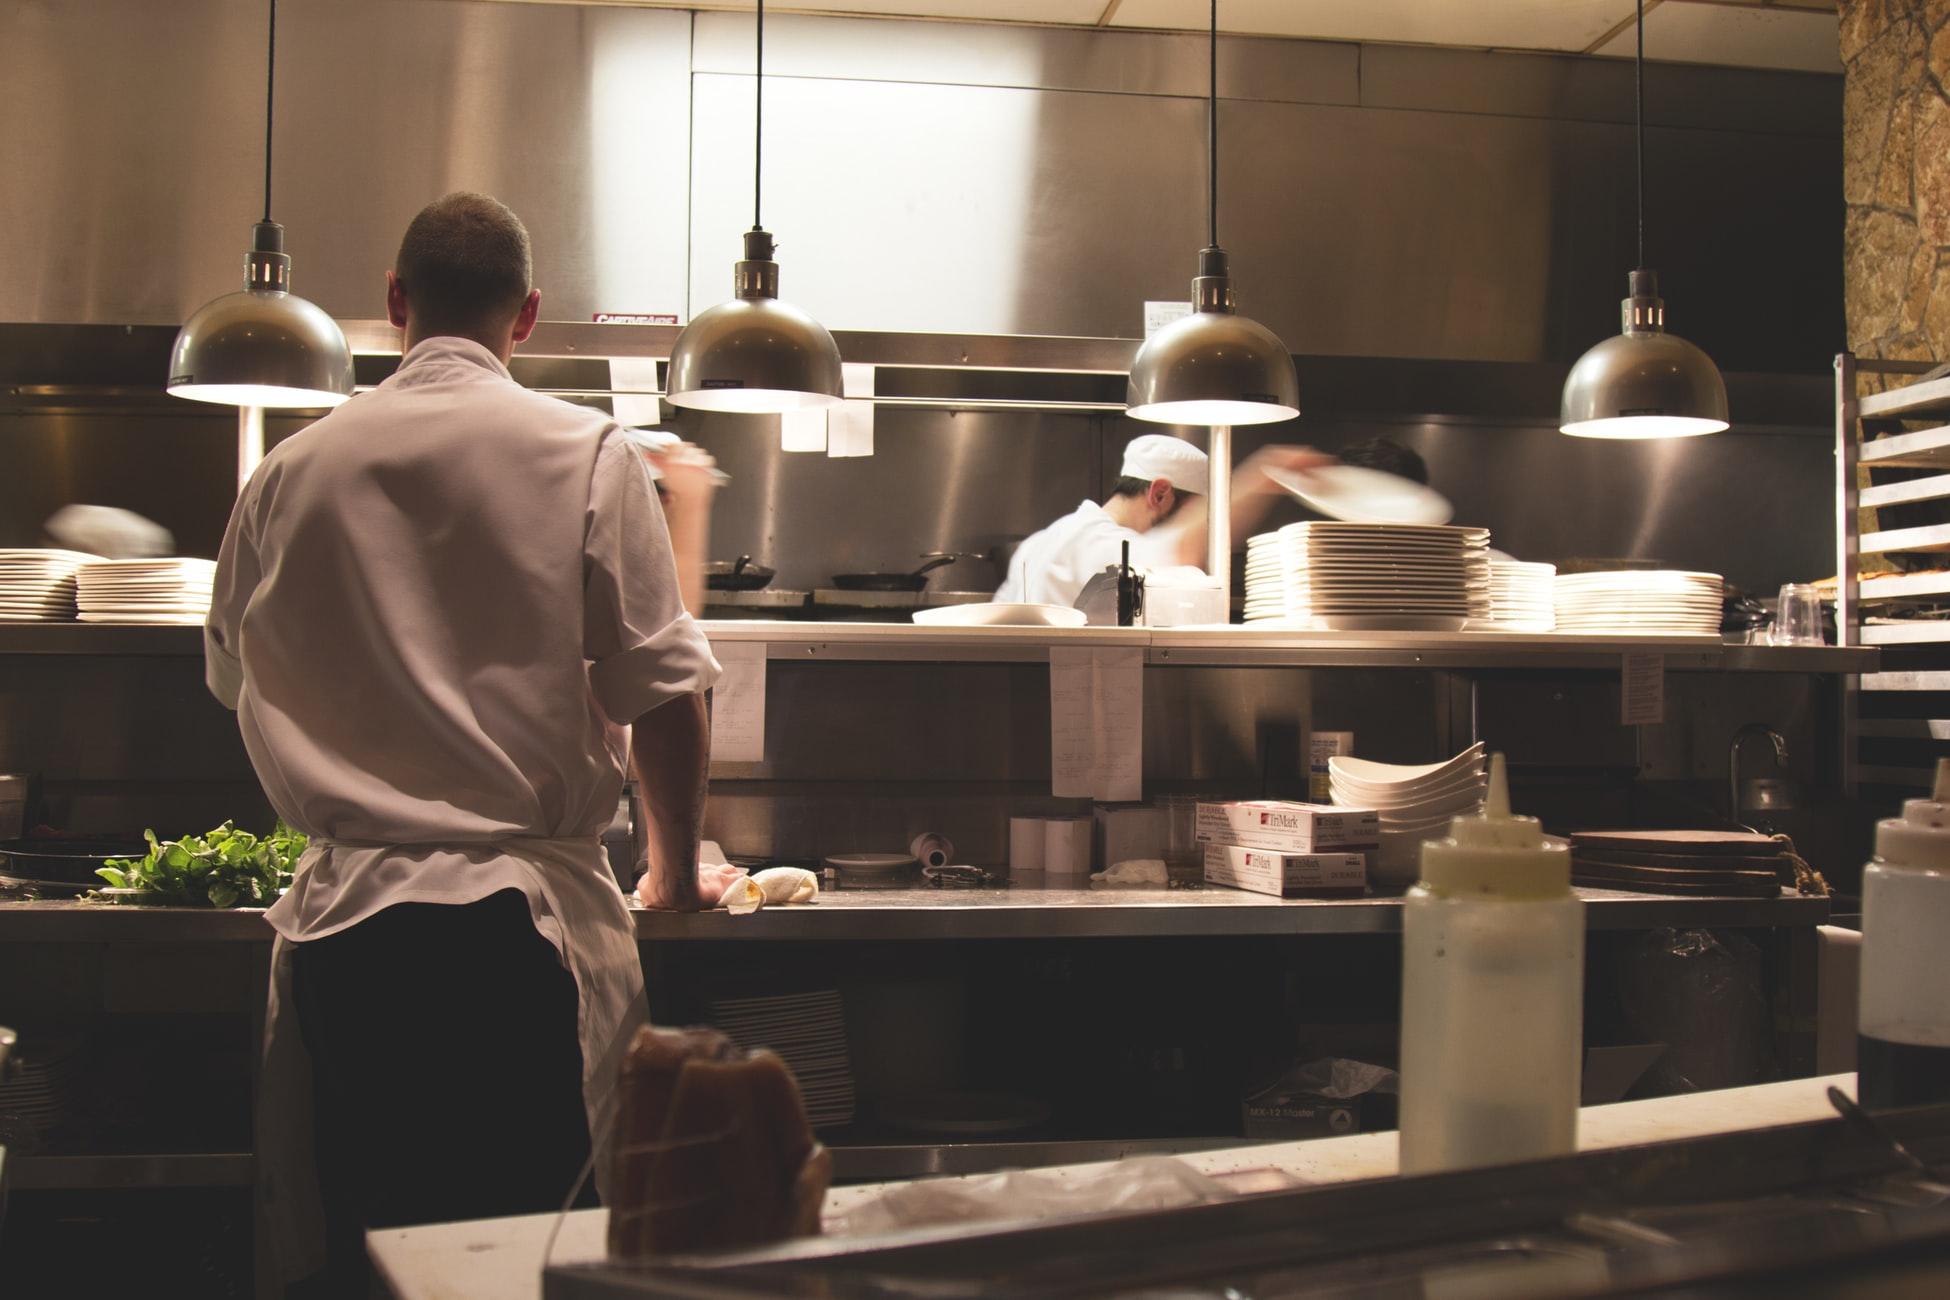 Ghost Kitchen Network Virtual Kitchen Raises $20M